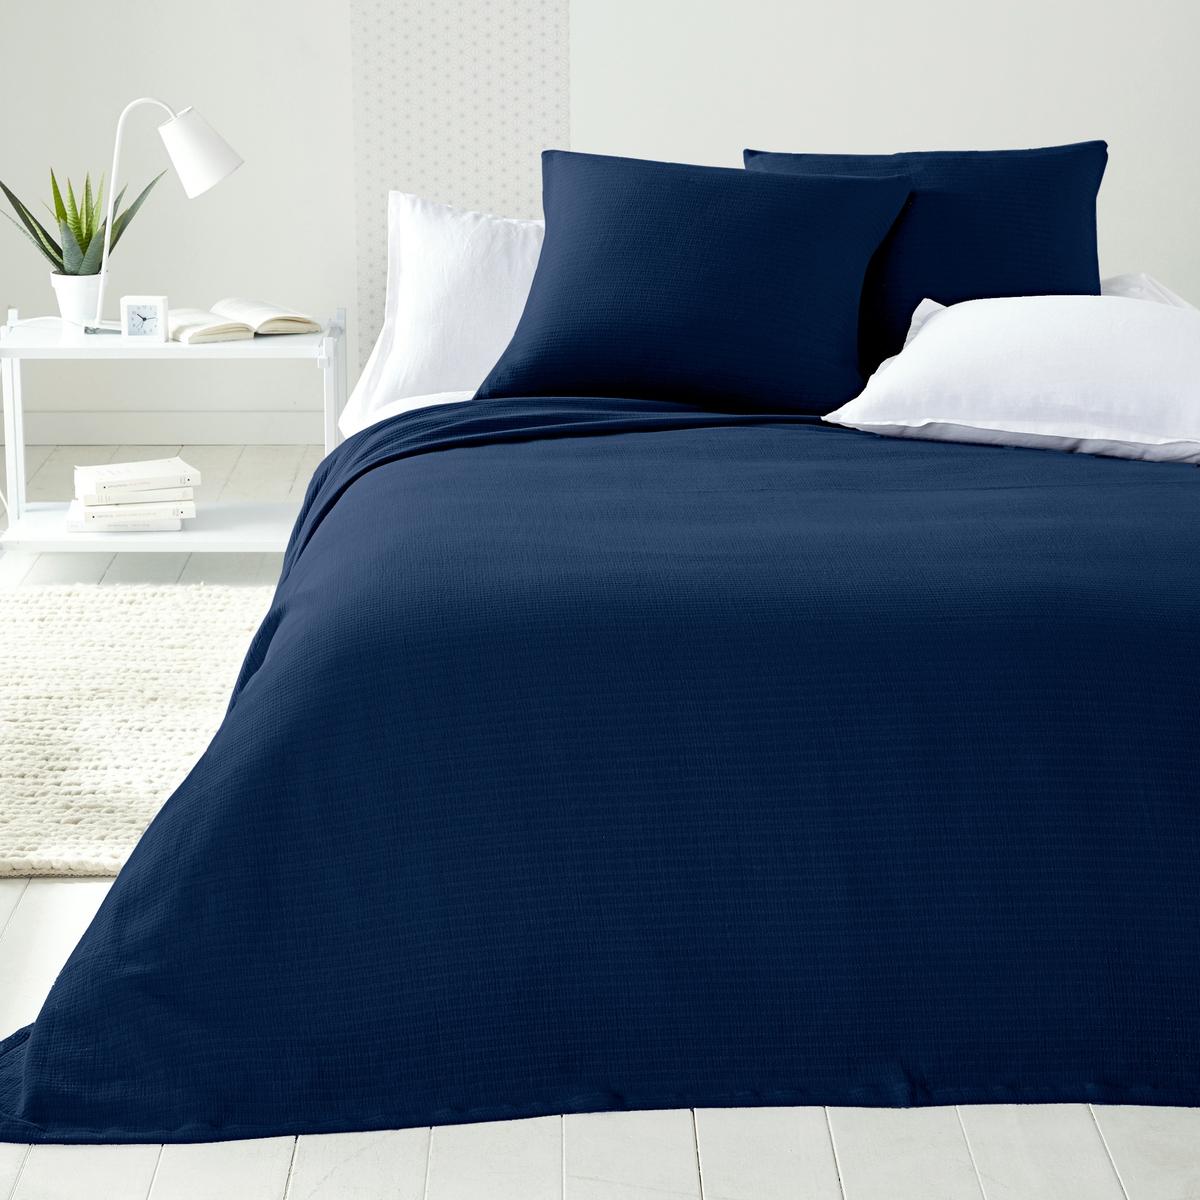 Покрывало La Redoute Для кровати Ihlow 150 x 150 см синий кровати 180 см